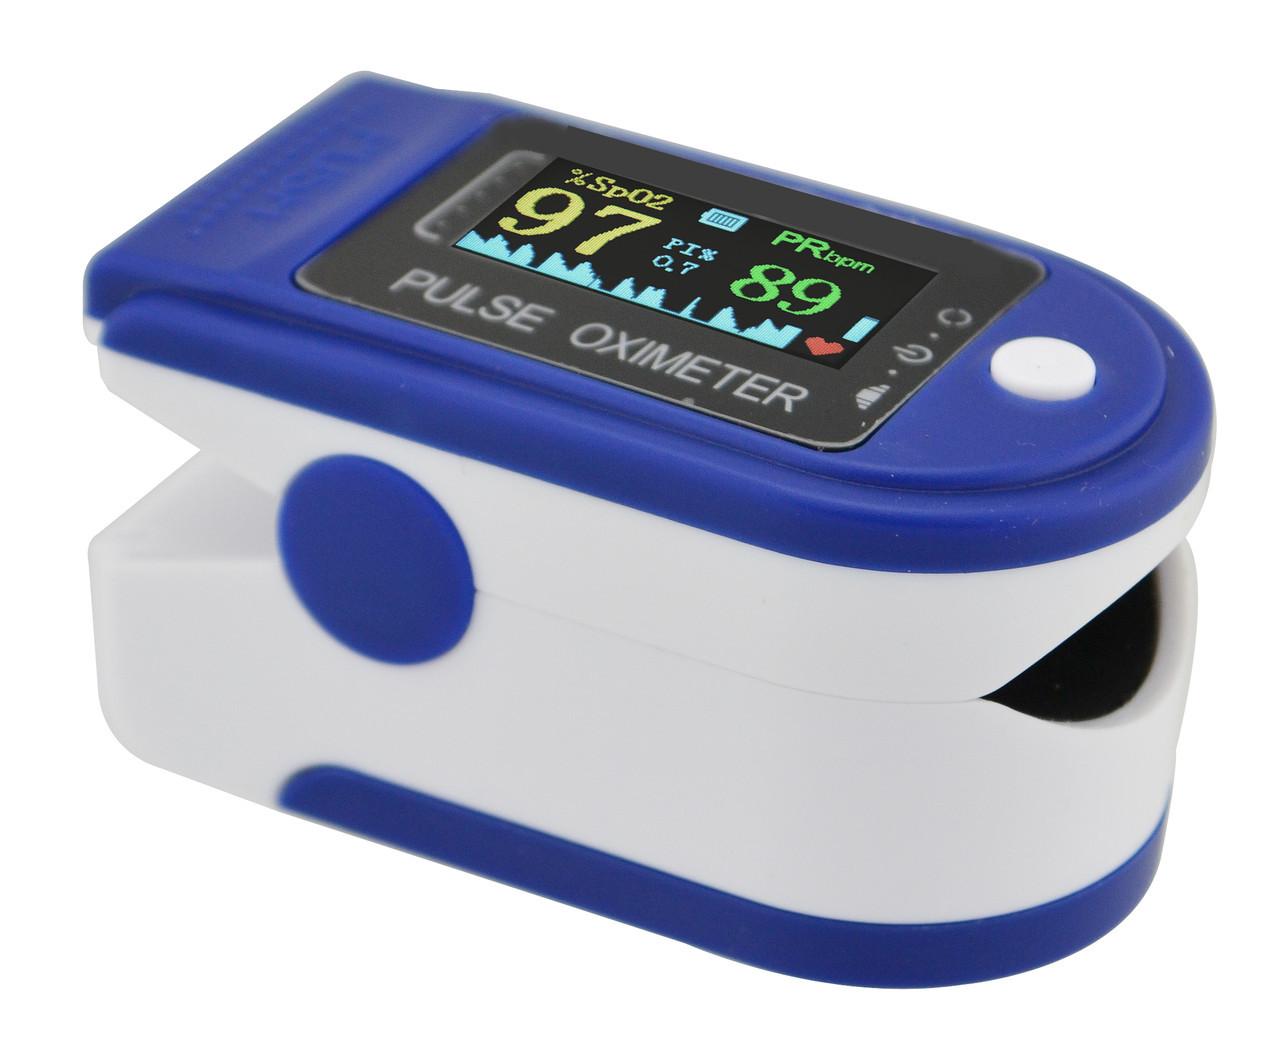 Пульсоксиметр пульсометр для вимірювання пульсу Fingertip Pulse Oximeter